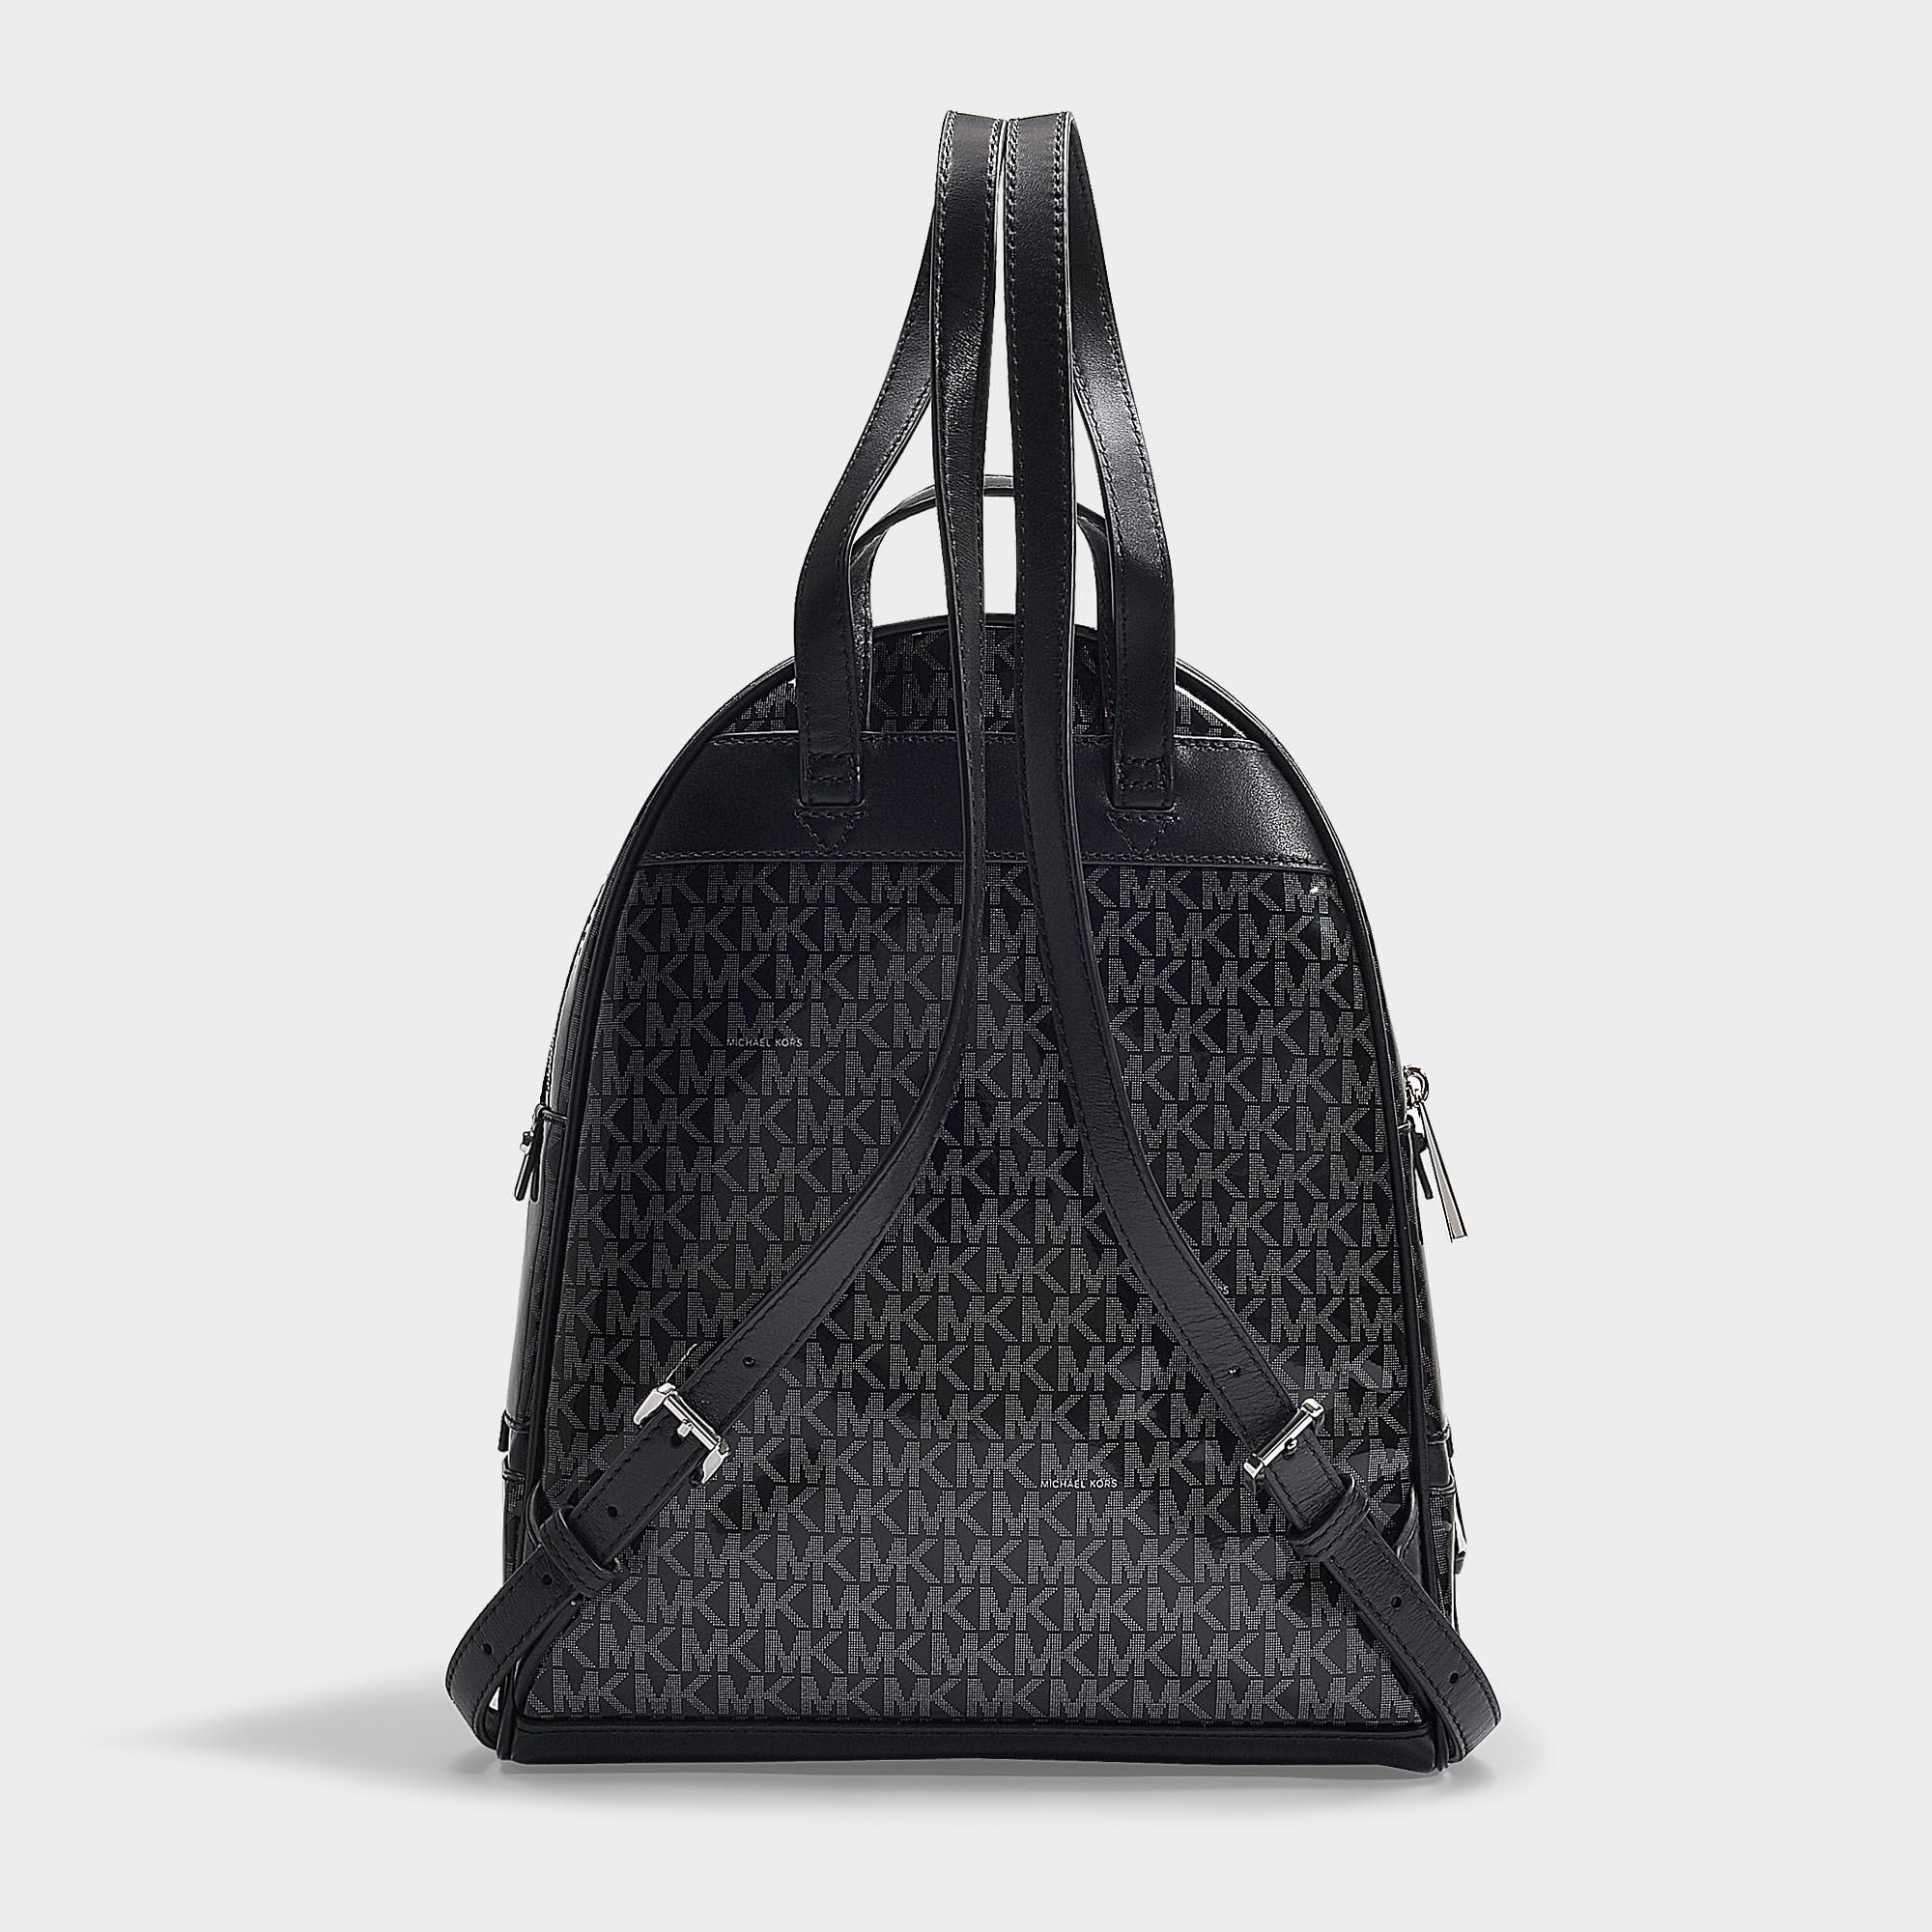 ef72abb132bc3d MICHAEL Michael Kors - Rhea Zip Medium Backpack In Black And Silver Pvc -  Lyst. View fullscreen